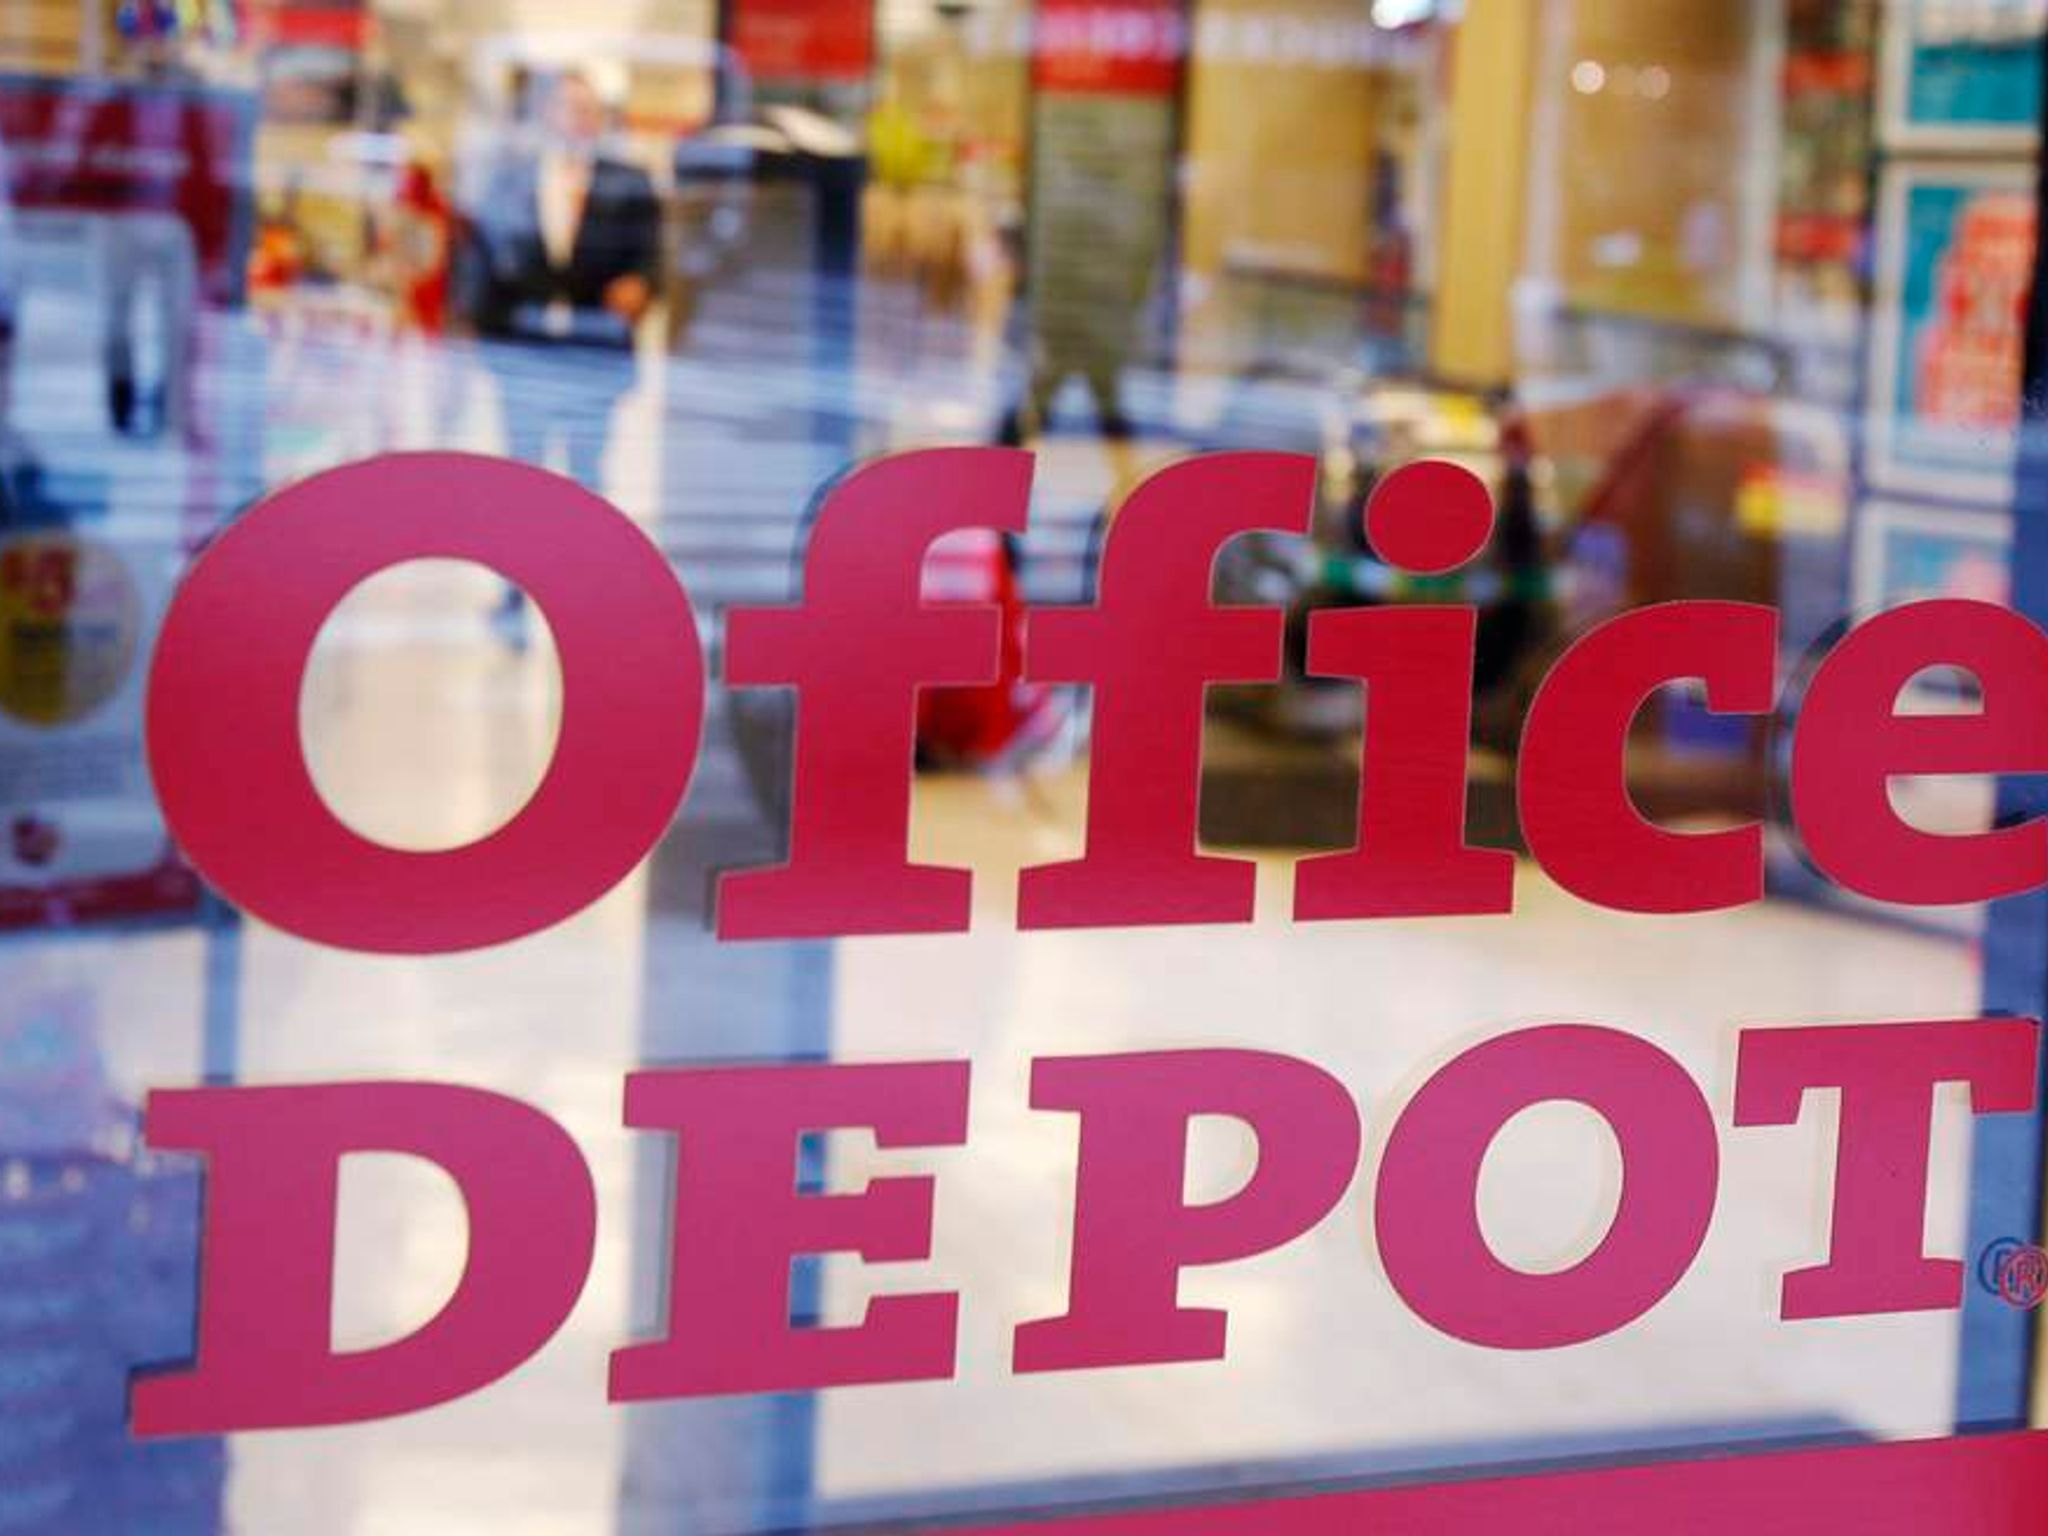 furniture brand logo  Office Depot amp OfficeMax Office